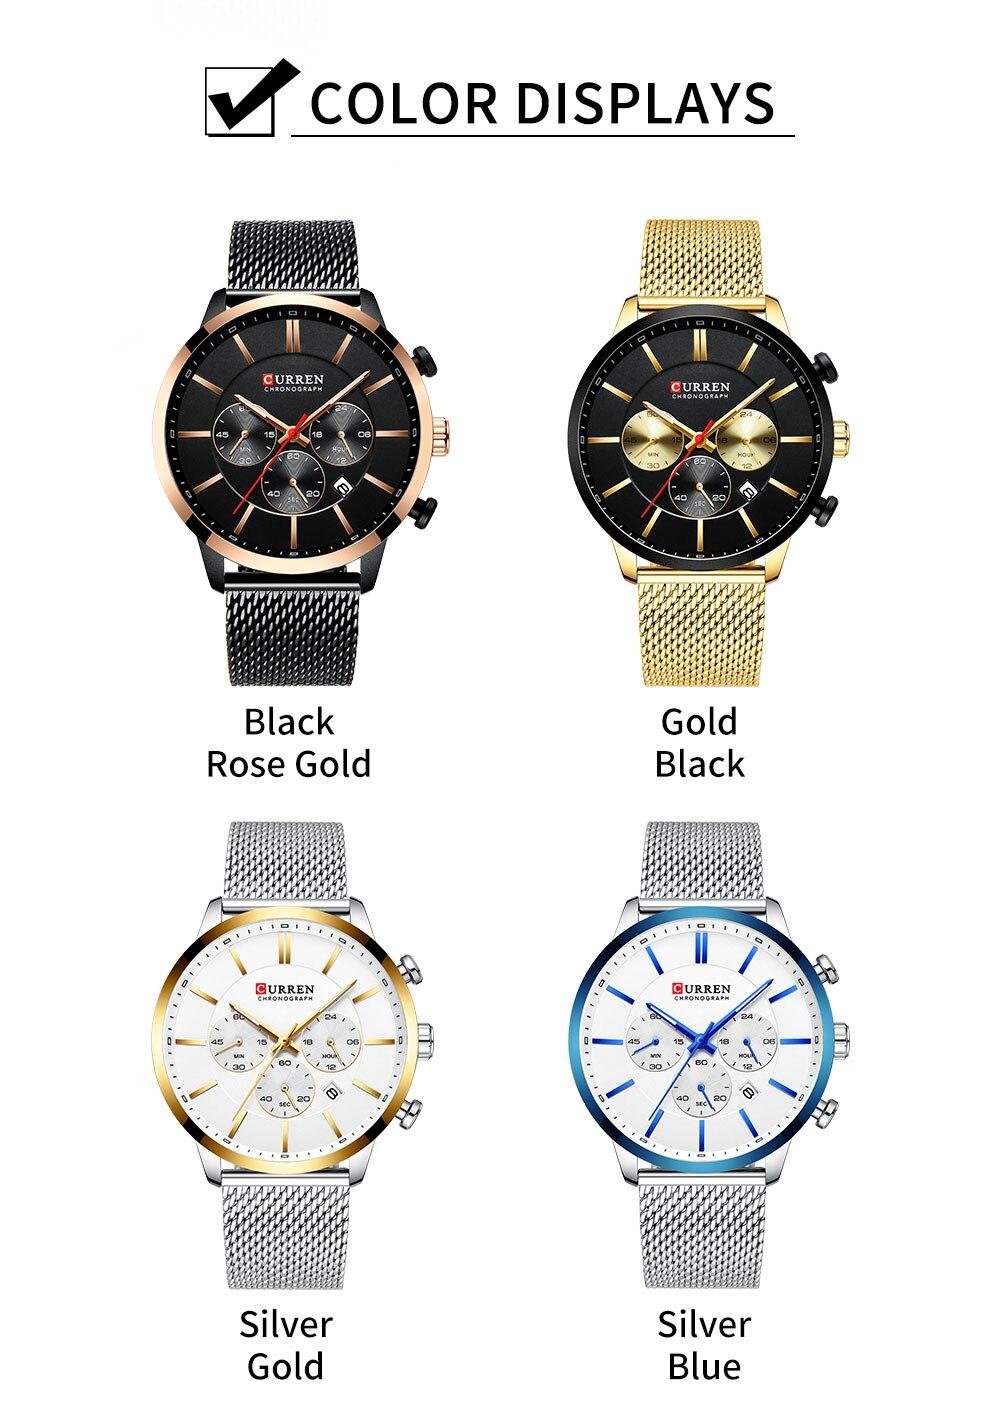 HTB1HOCfa21G3KVjSZFkq6yK4XXao CURREN Watch Men Fashion Business Watches Men's Casual Waterproof Quartz Wristwatch Blue Steel Clock Relogio Masculino